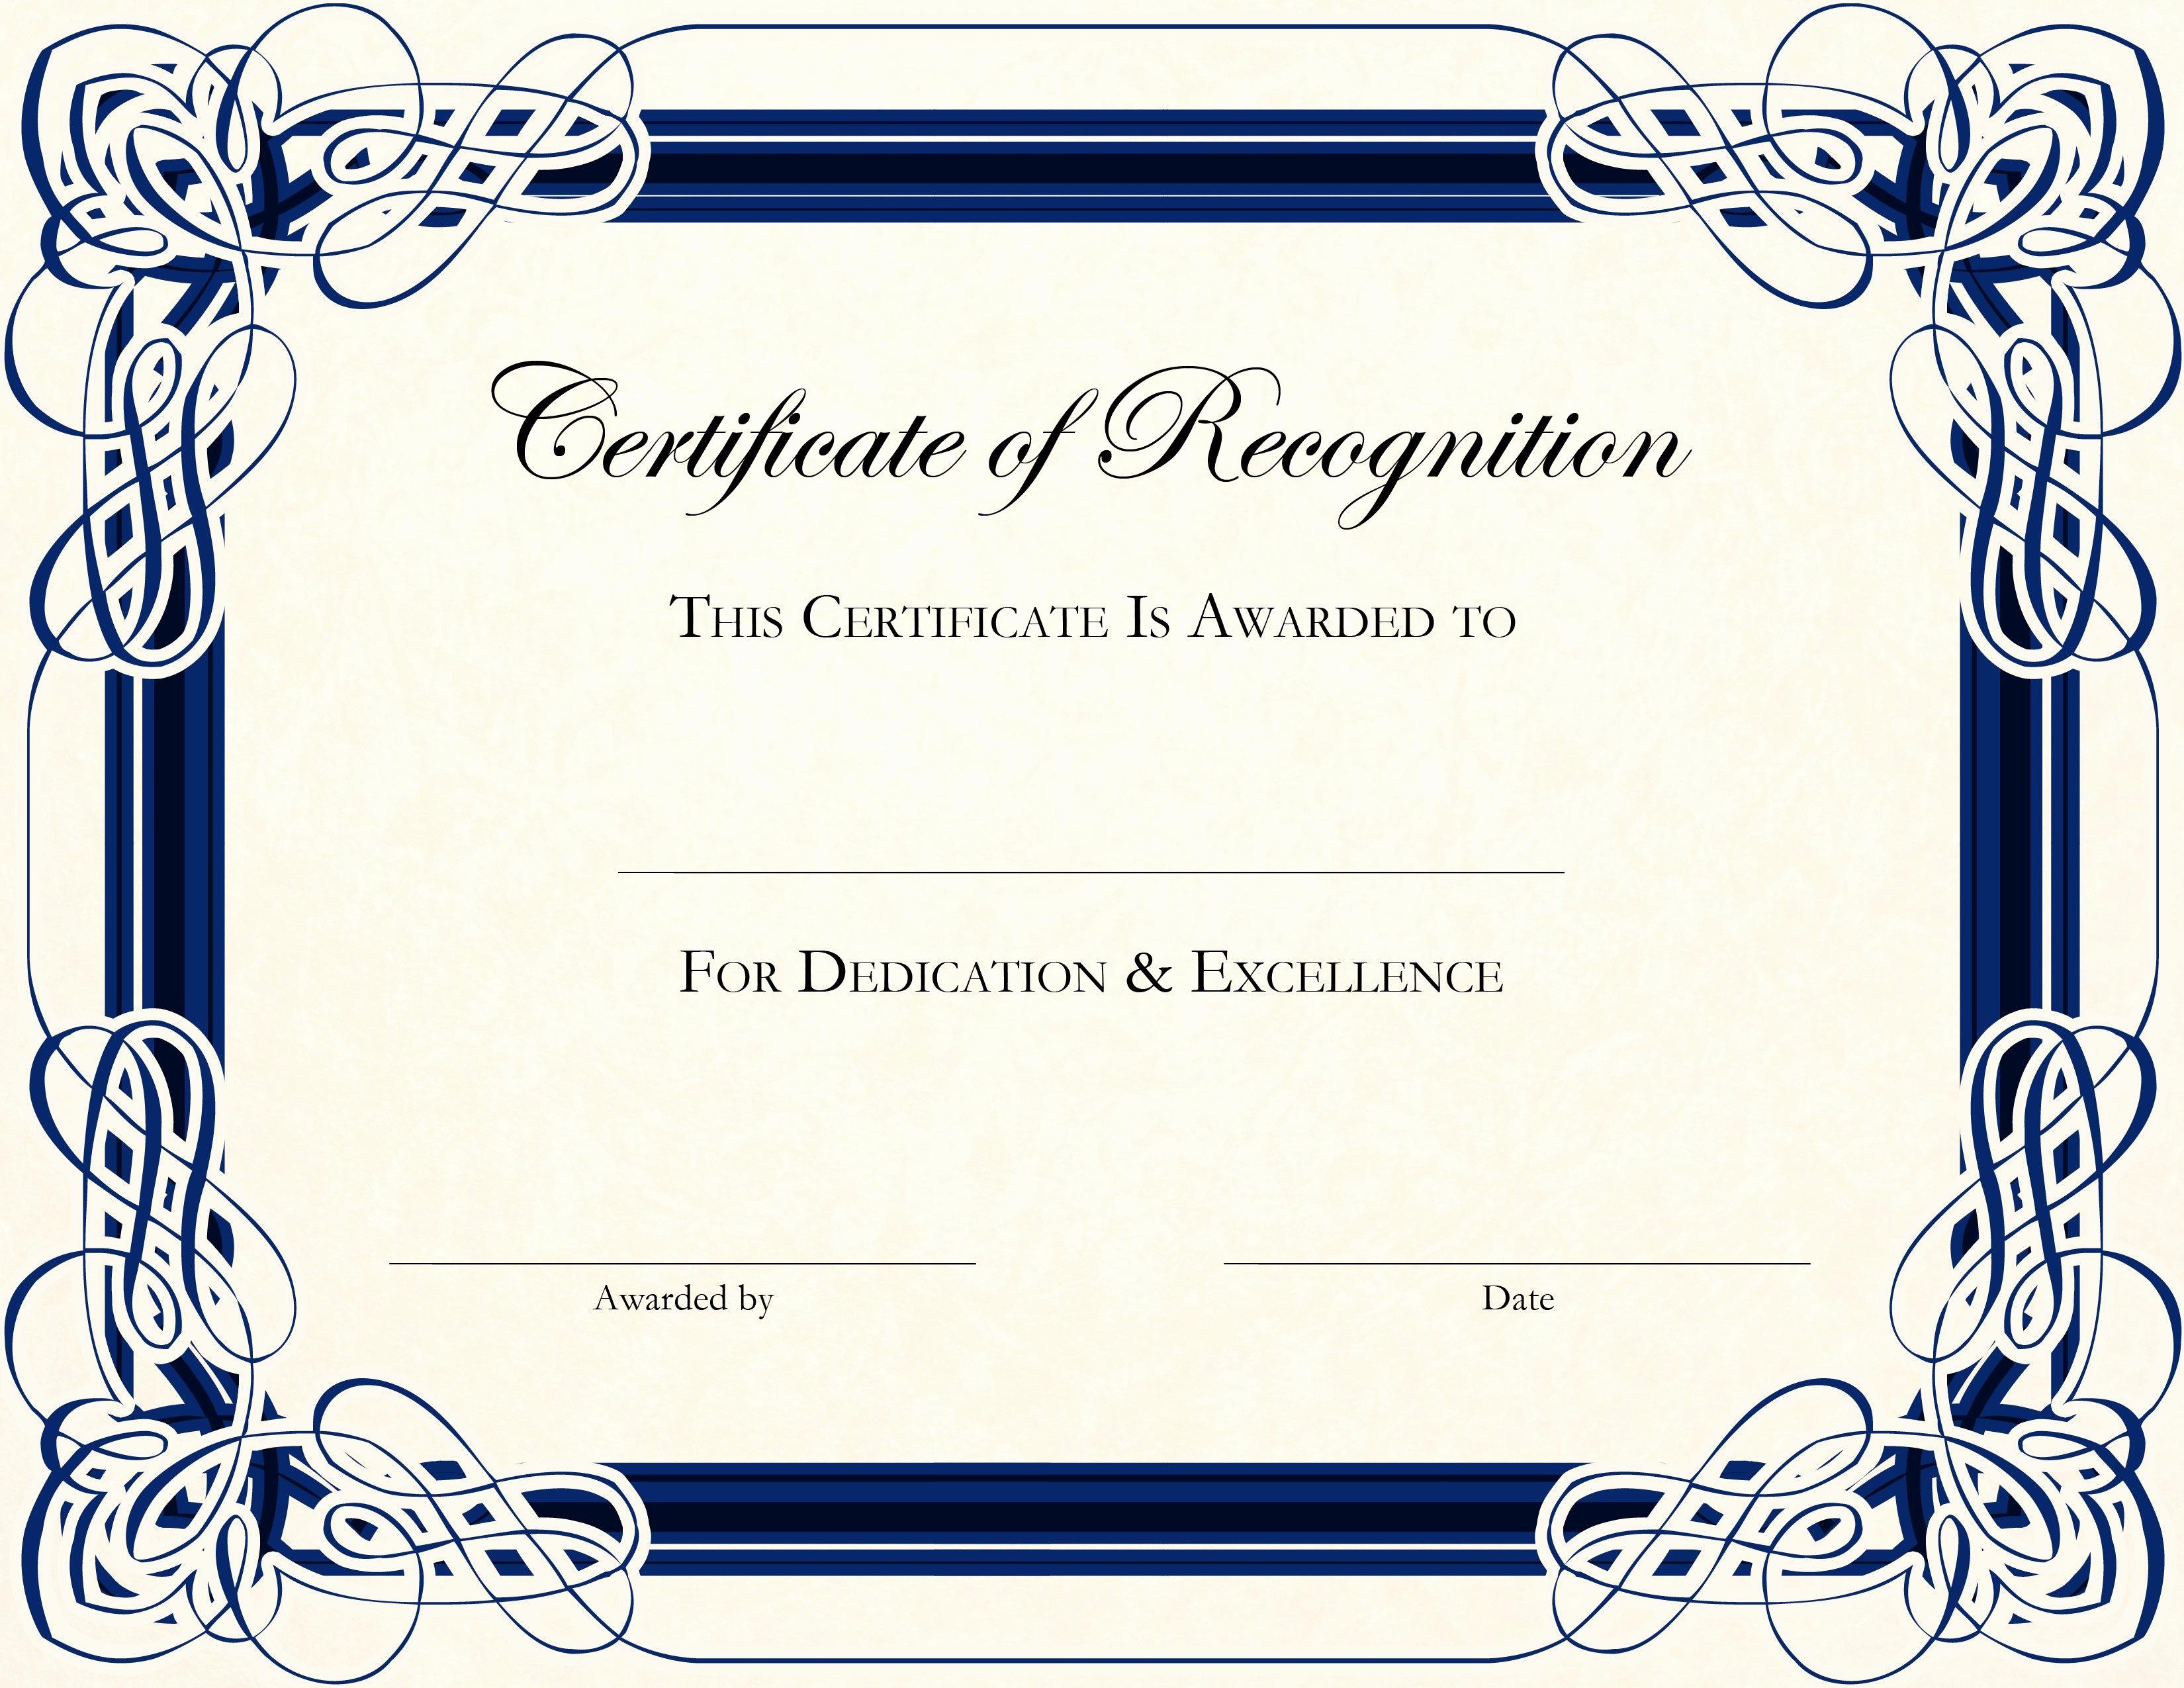 Free Printable Award Certificates Luxury Free Printable Certificate Templates for Teachers